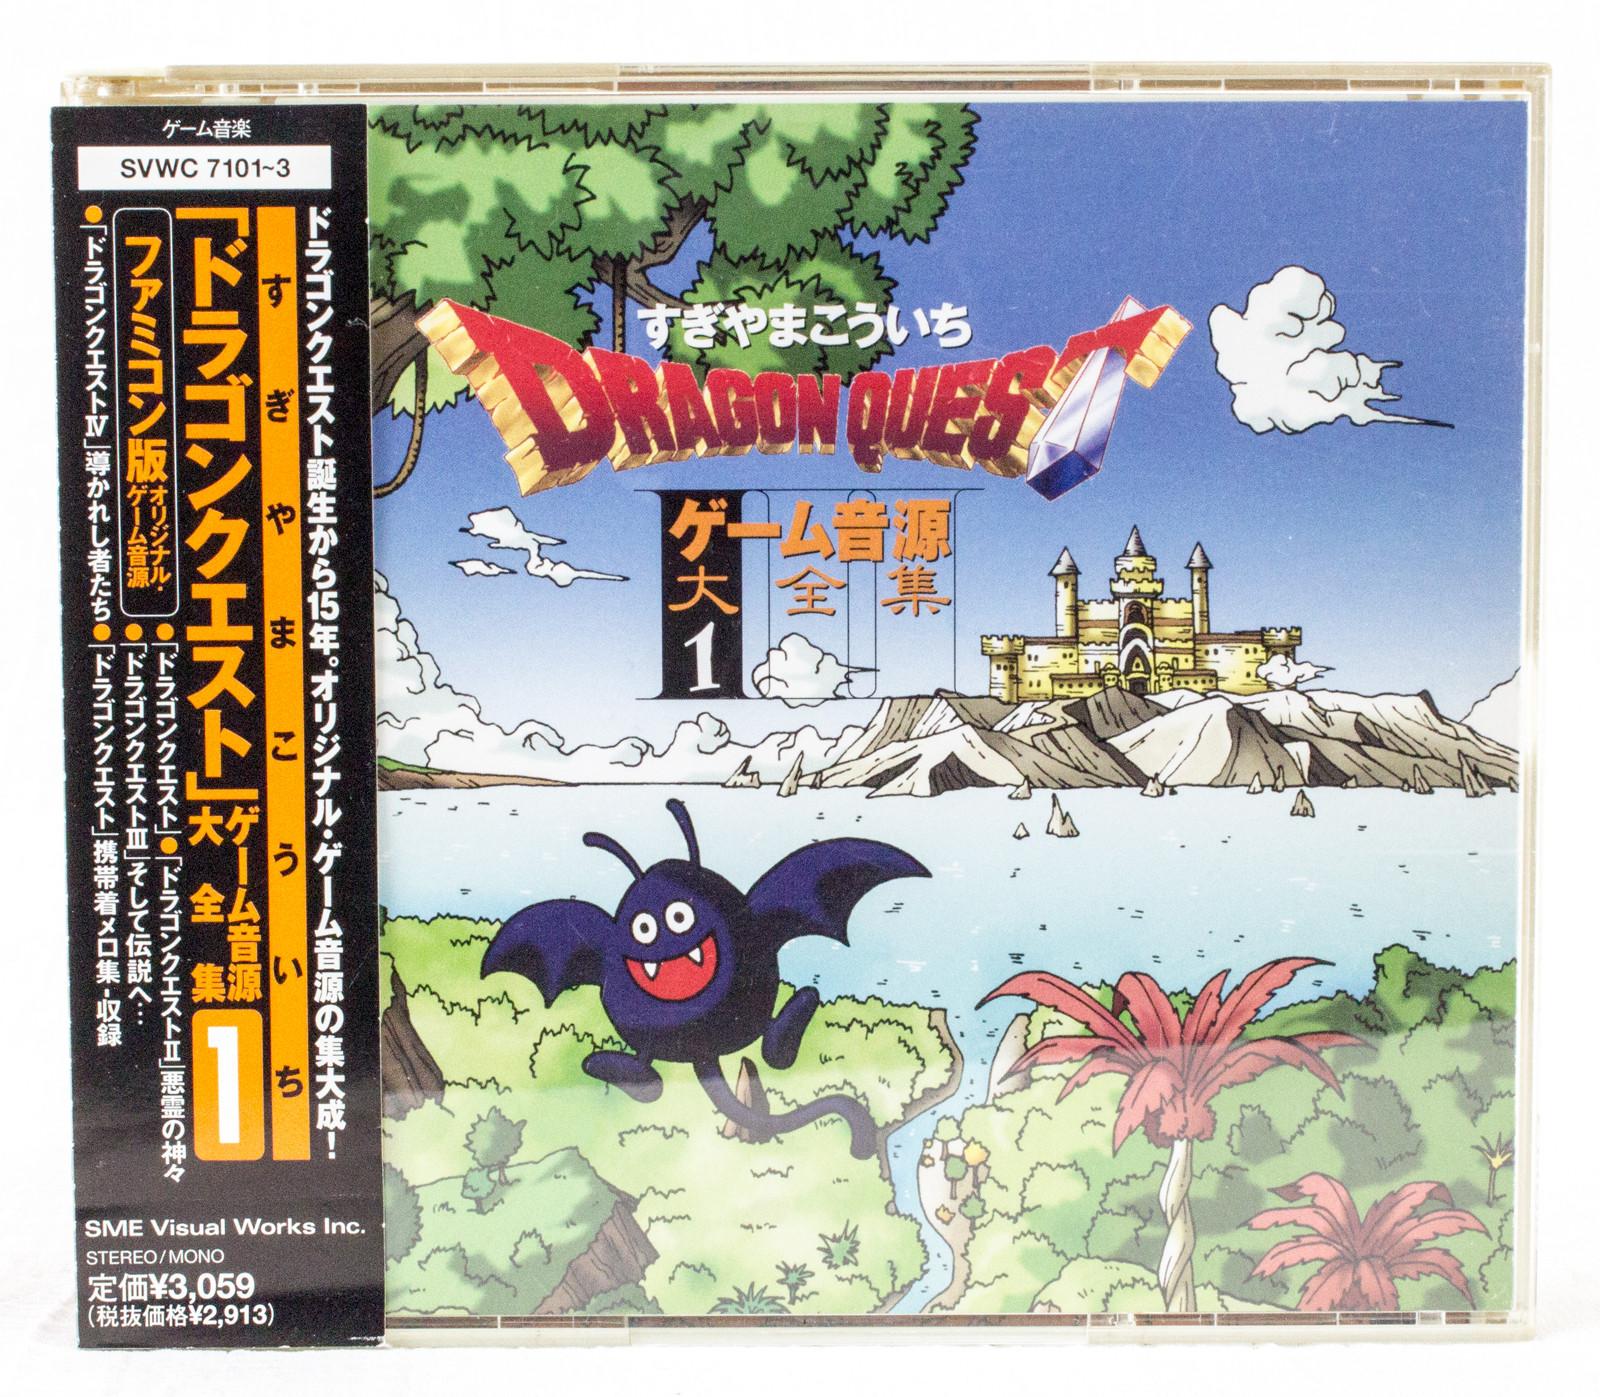 Dragon Quest 3Disk Set CD Album Game Music Super Collection Vol.1 JAPAN